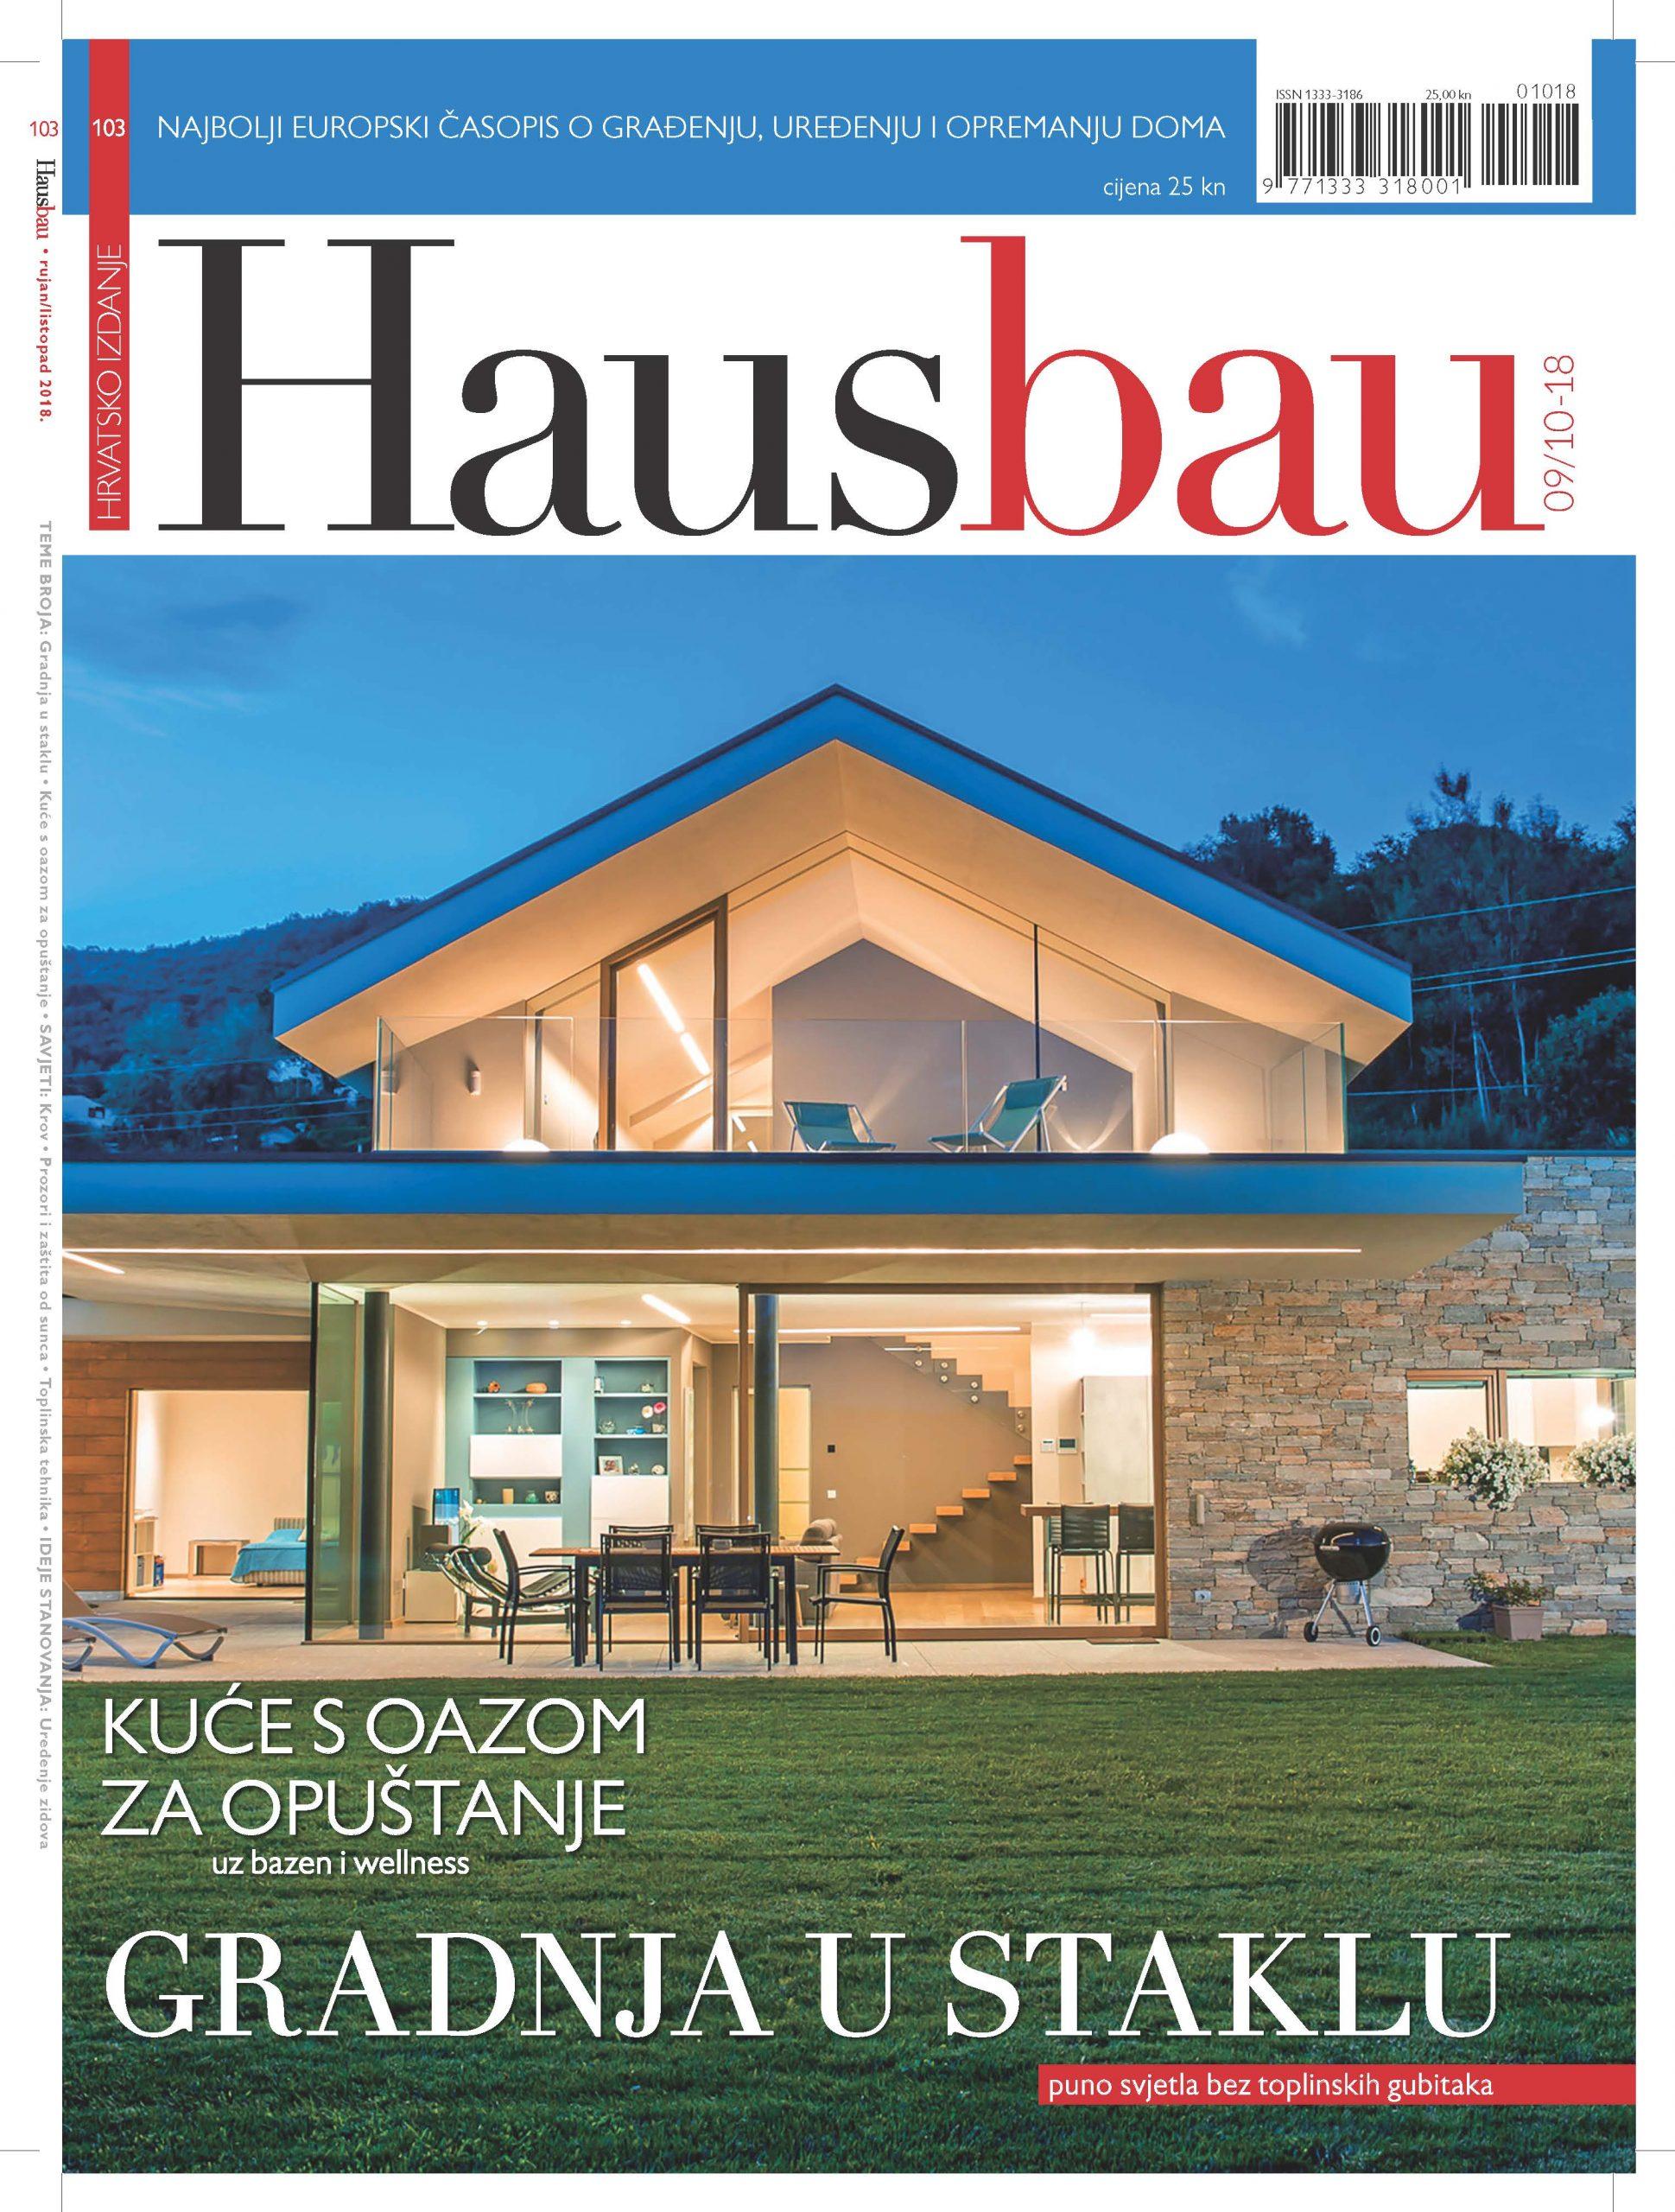 Hausbau br.103 (09/10 2018)